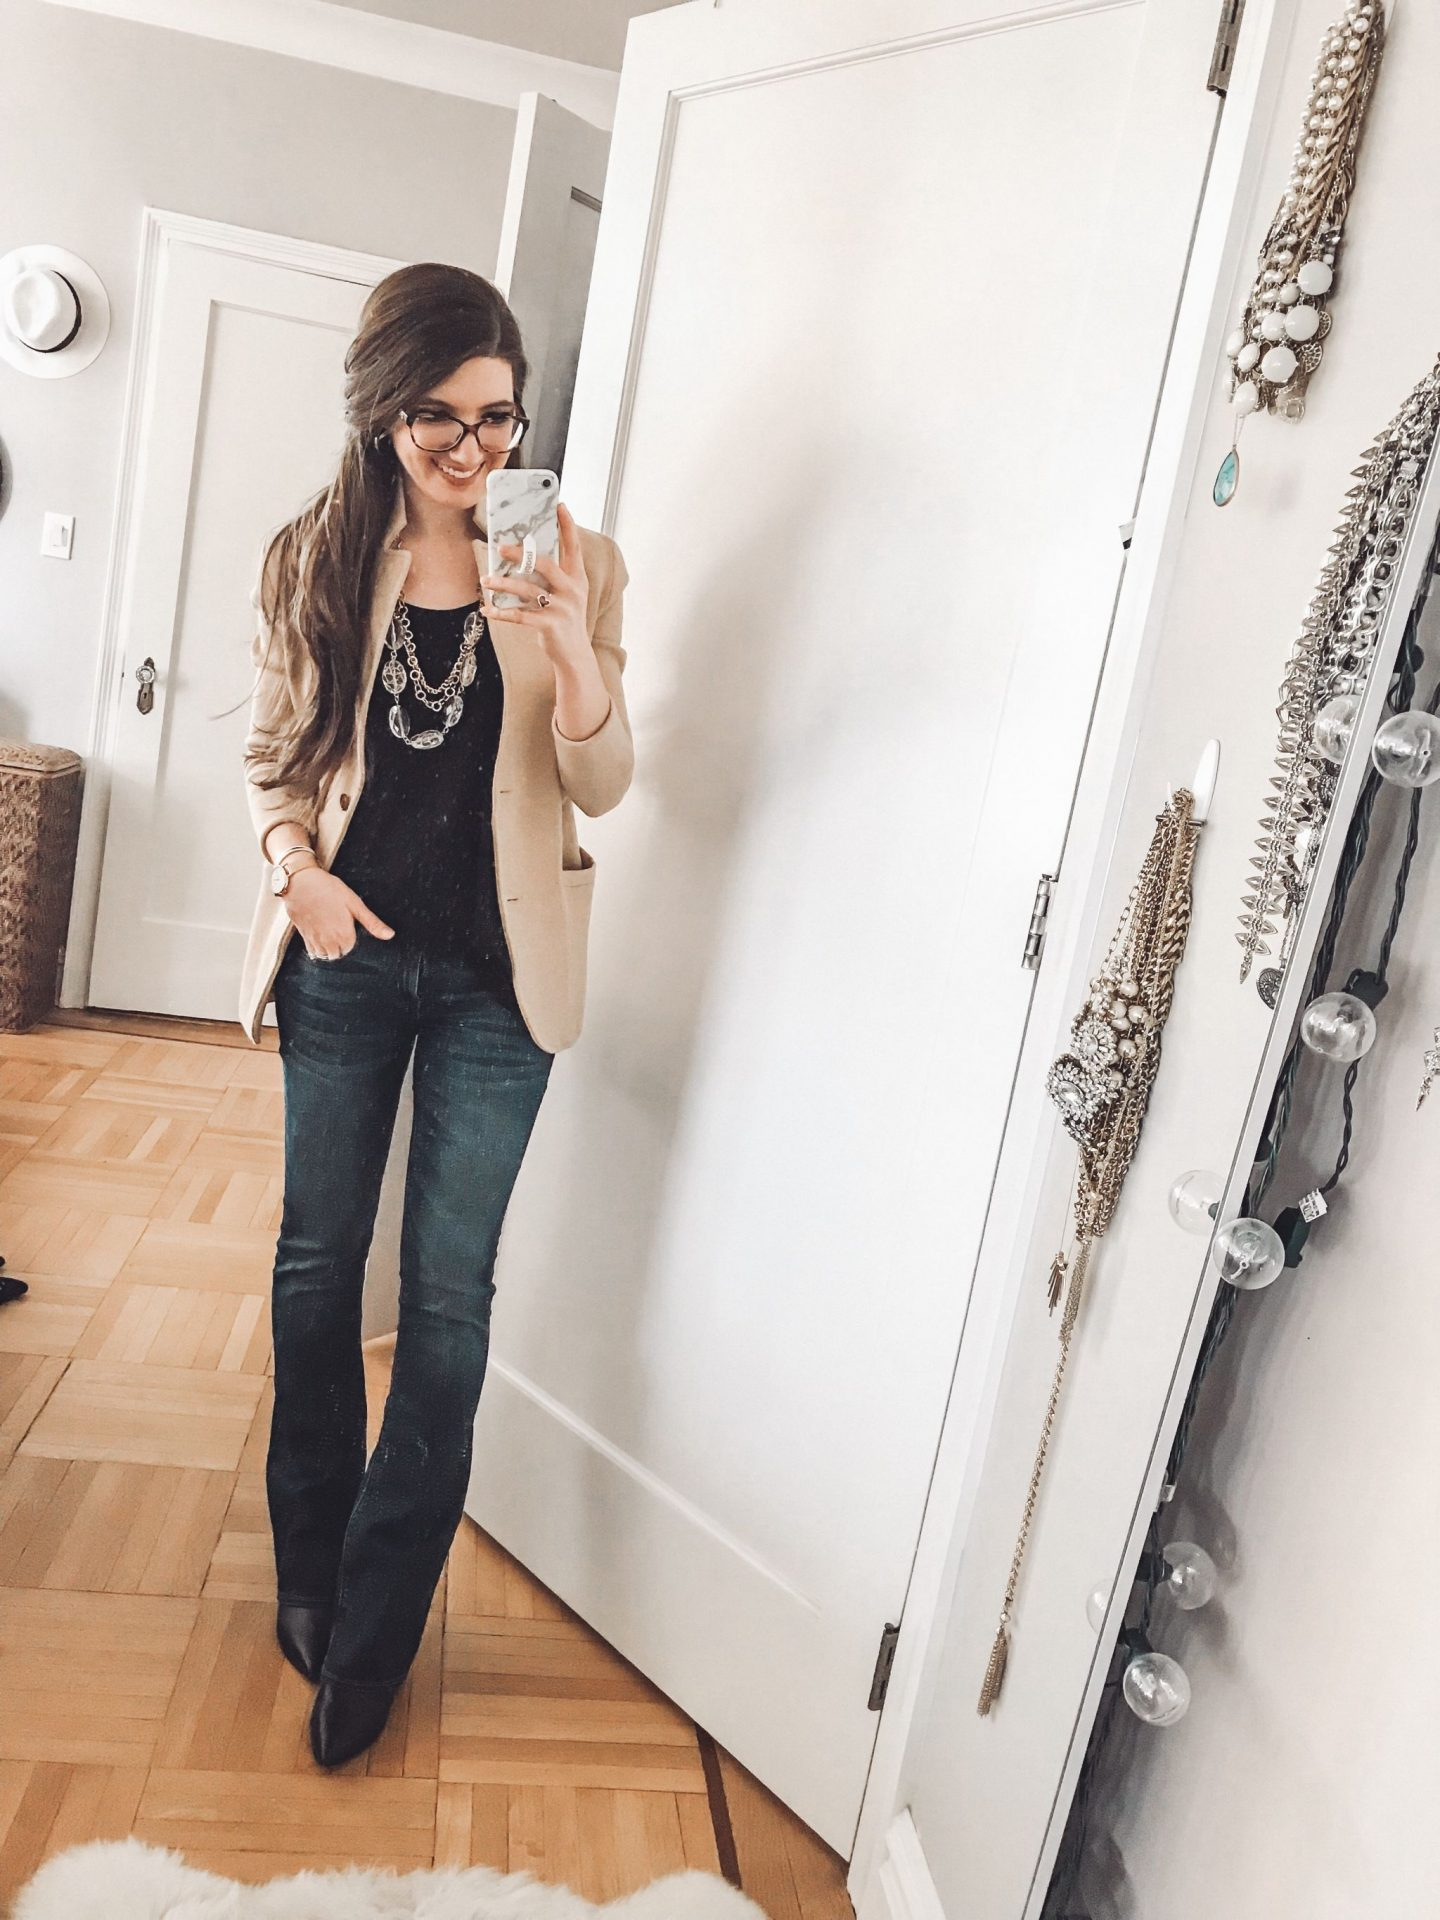 Work Wear Wednesday- Business Casual